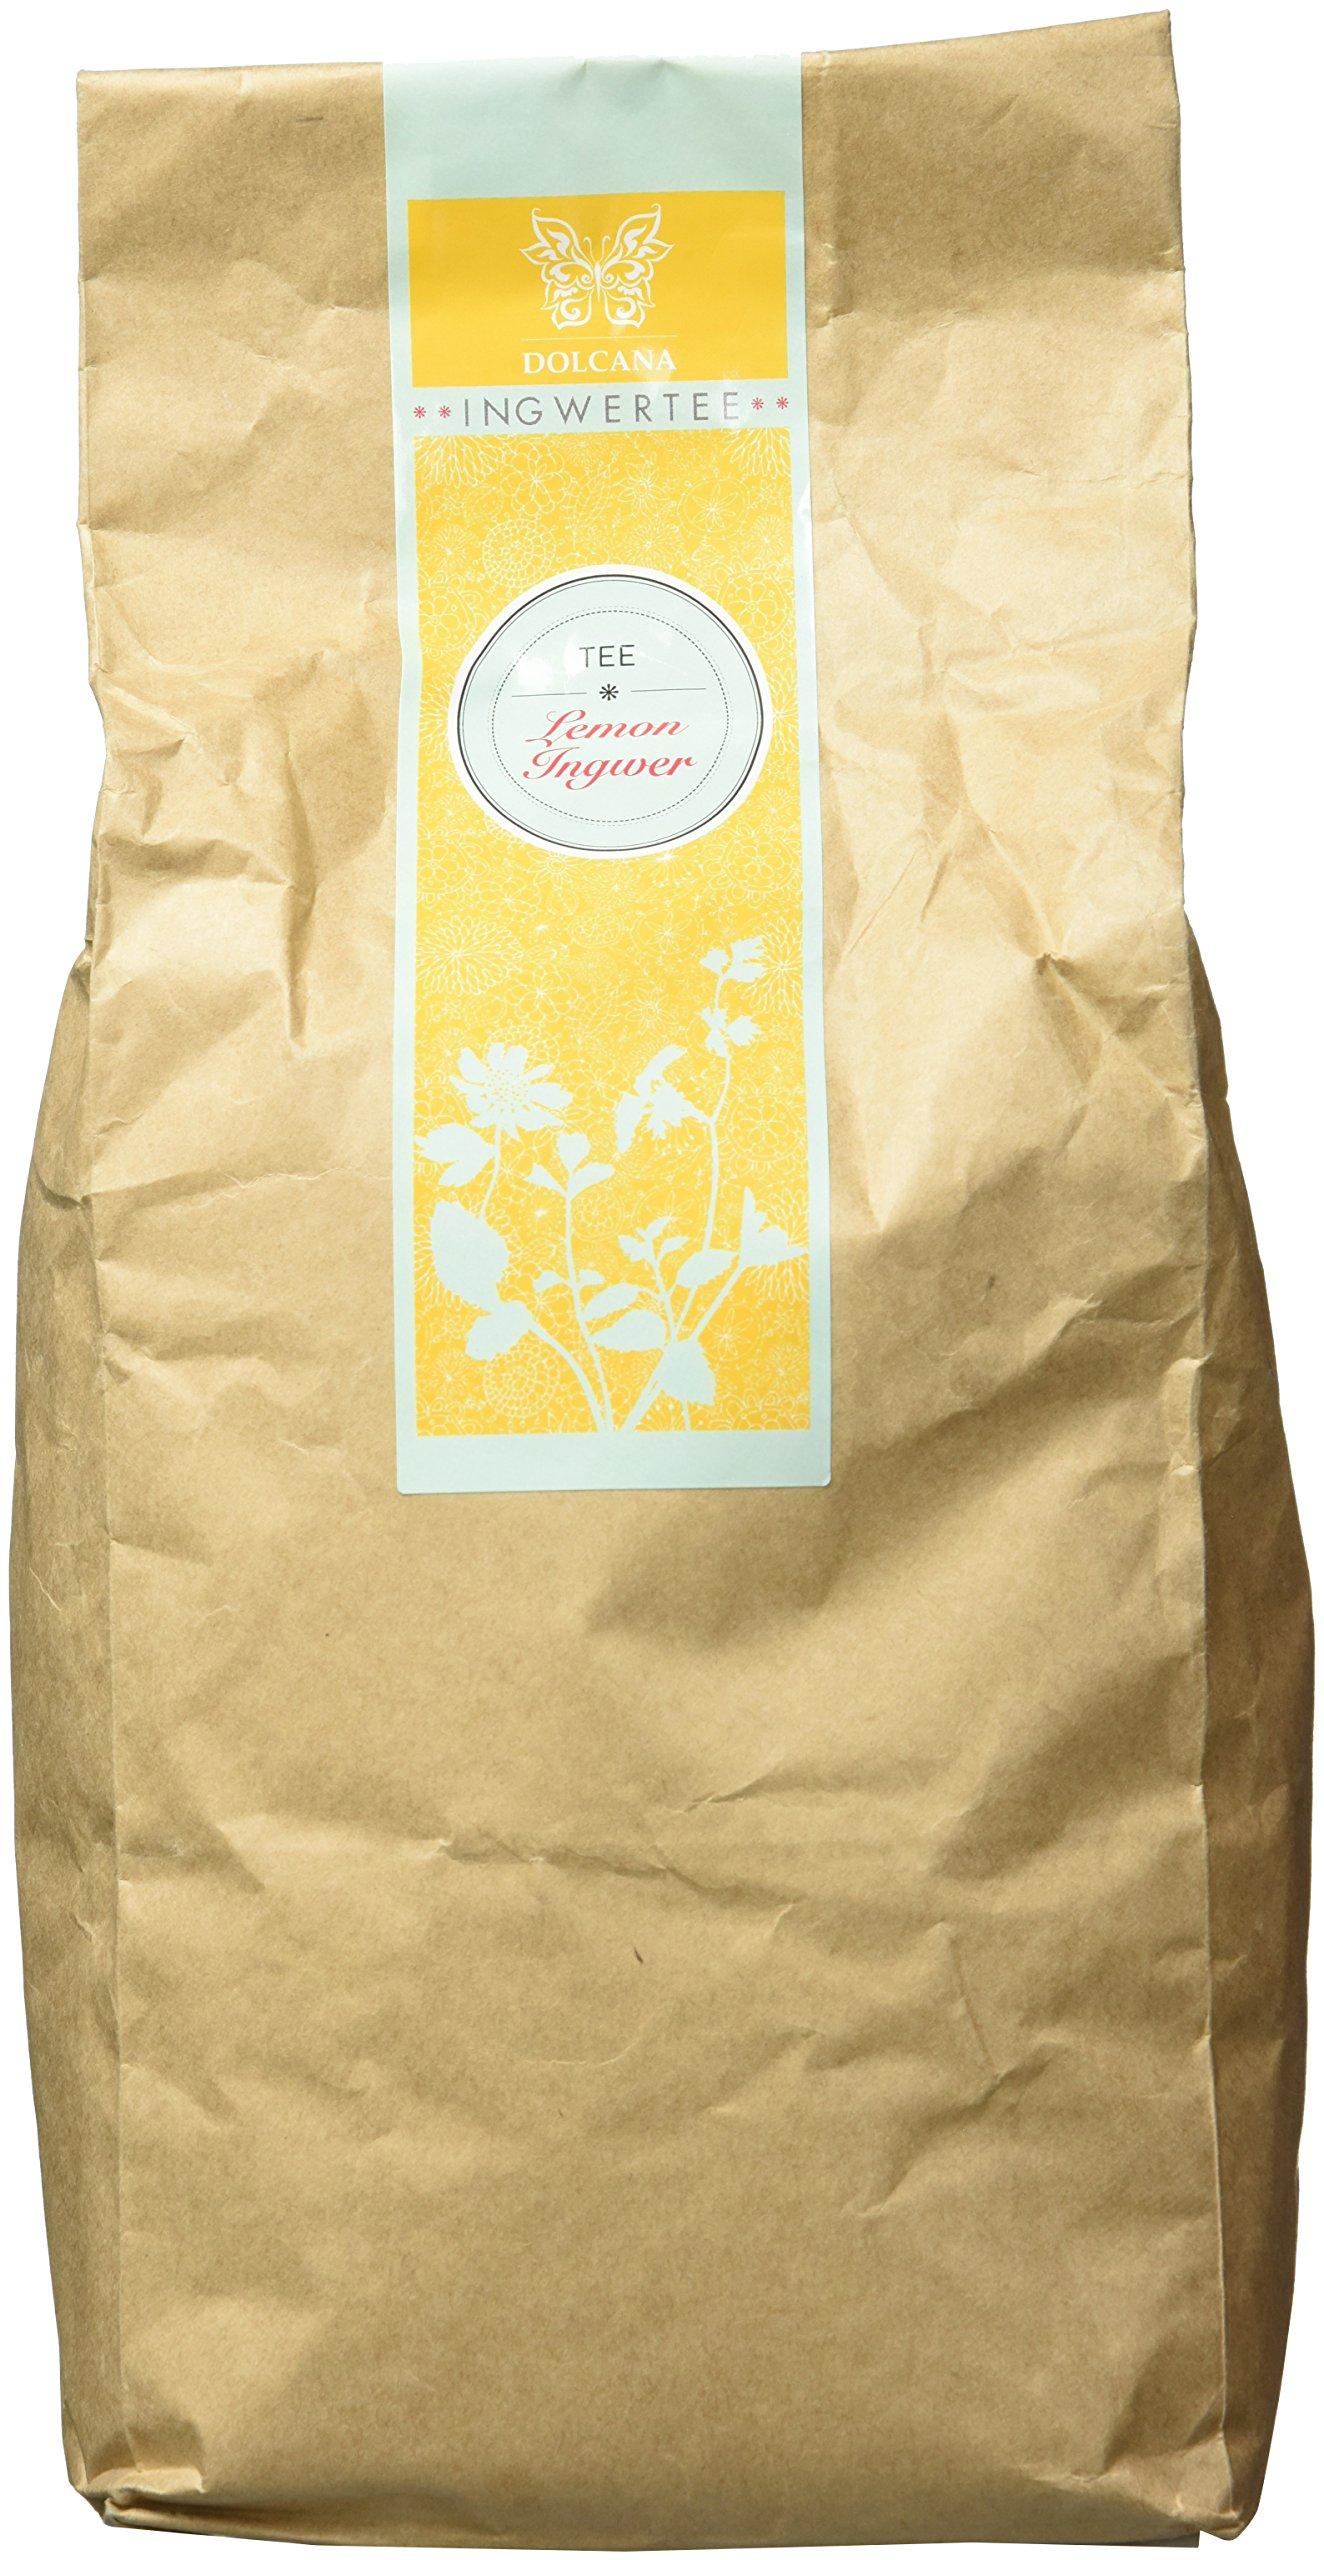 Dolcana-Ingwer-Tee-Rotbusch-LemonIngwer